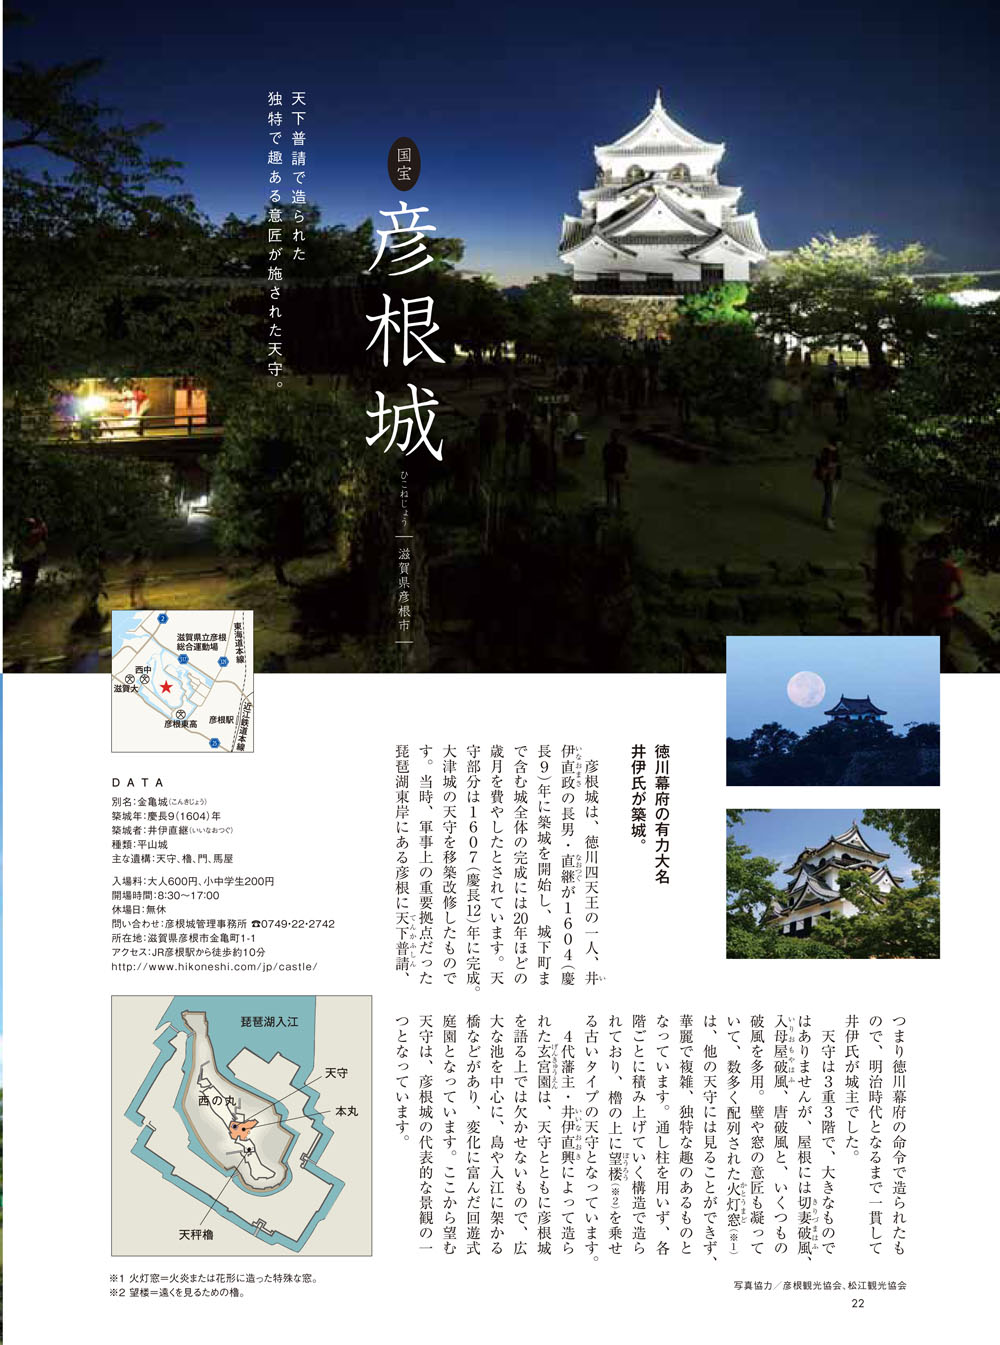 YUCARI_26_22.jpg